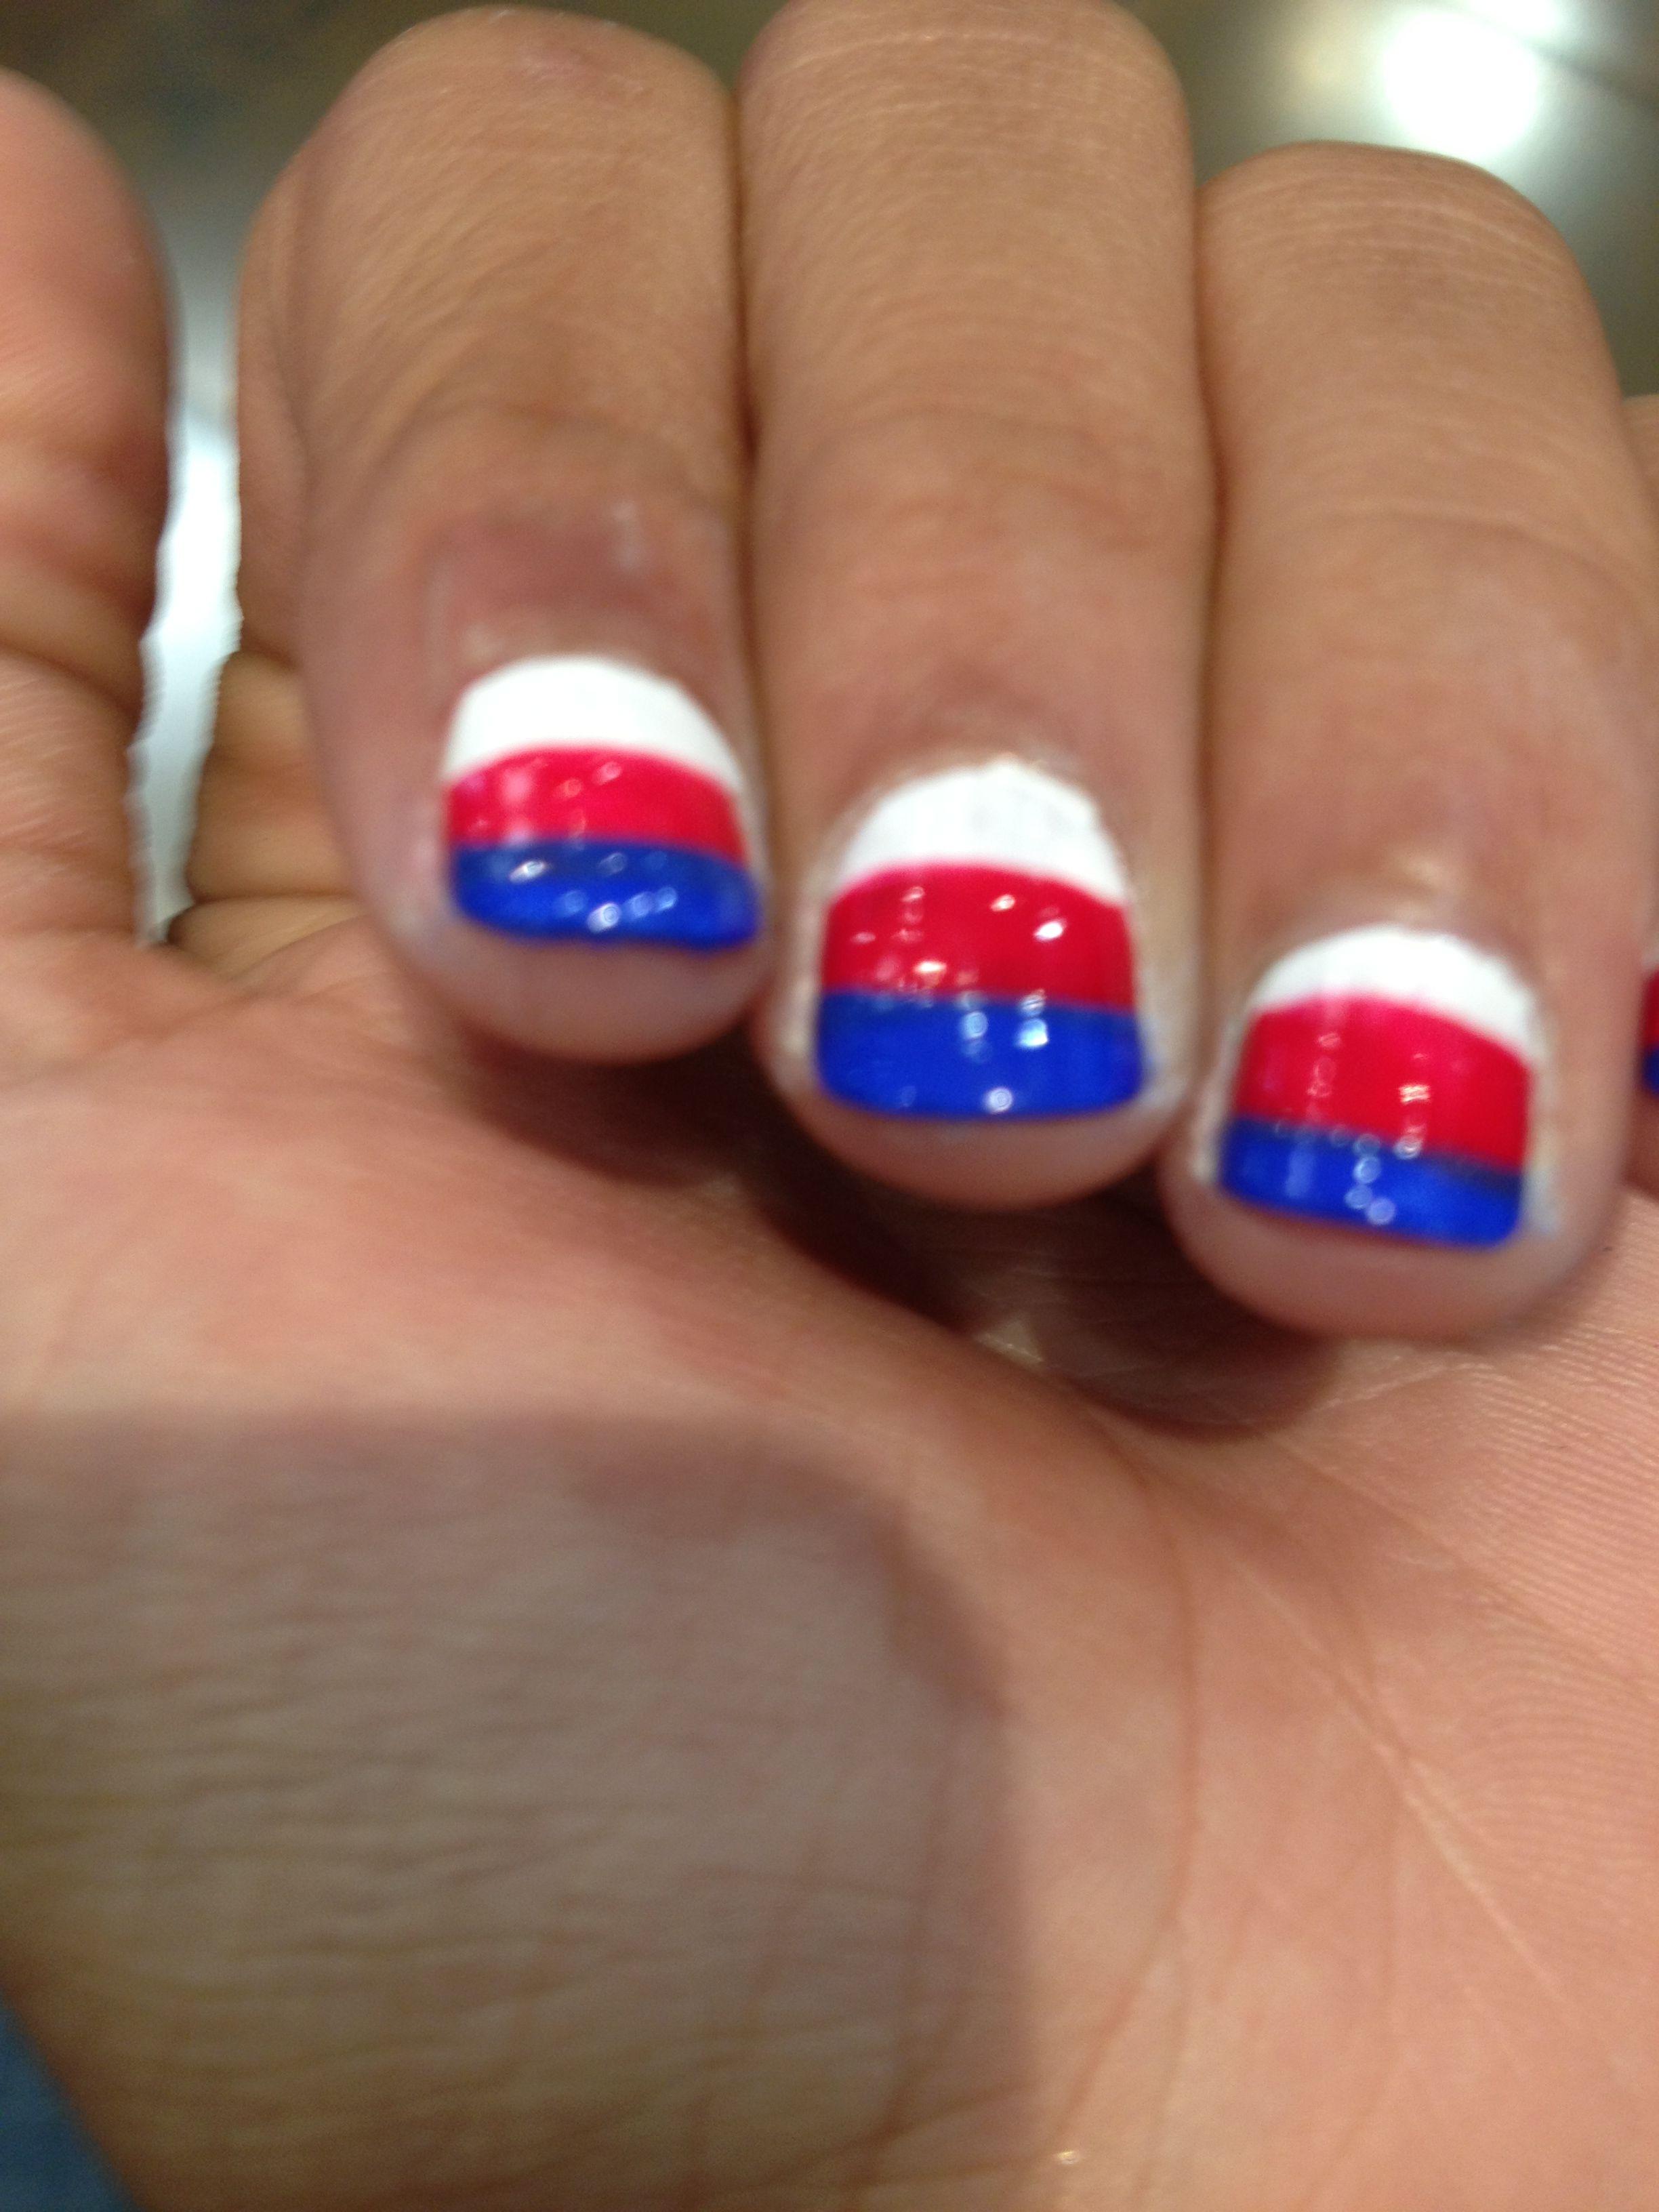 russia flag nail polish | manic panic | Pinterest | Flag nails